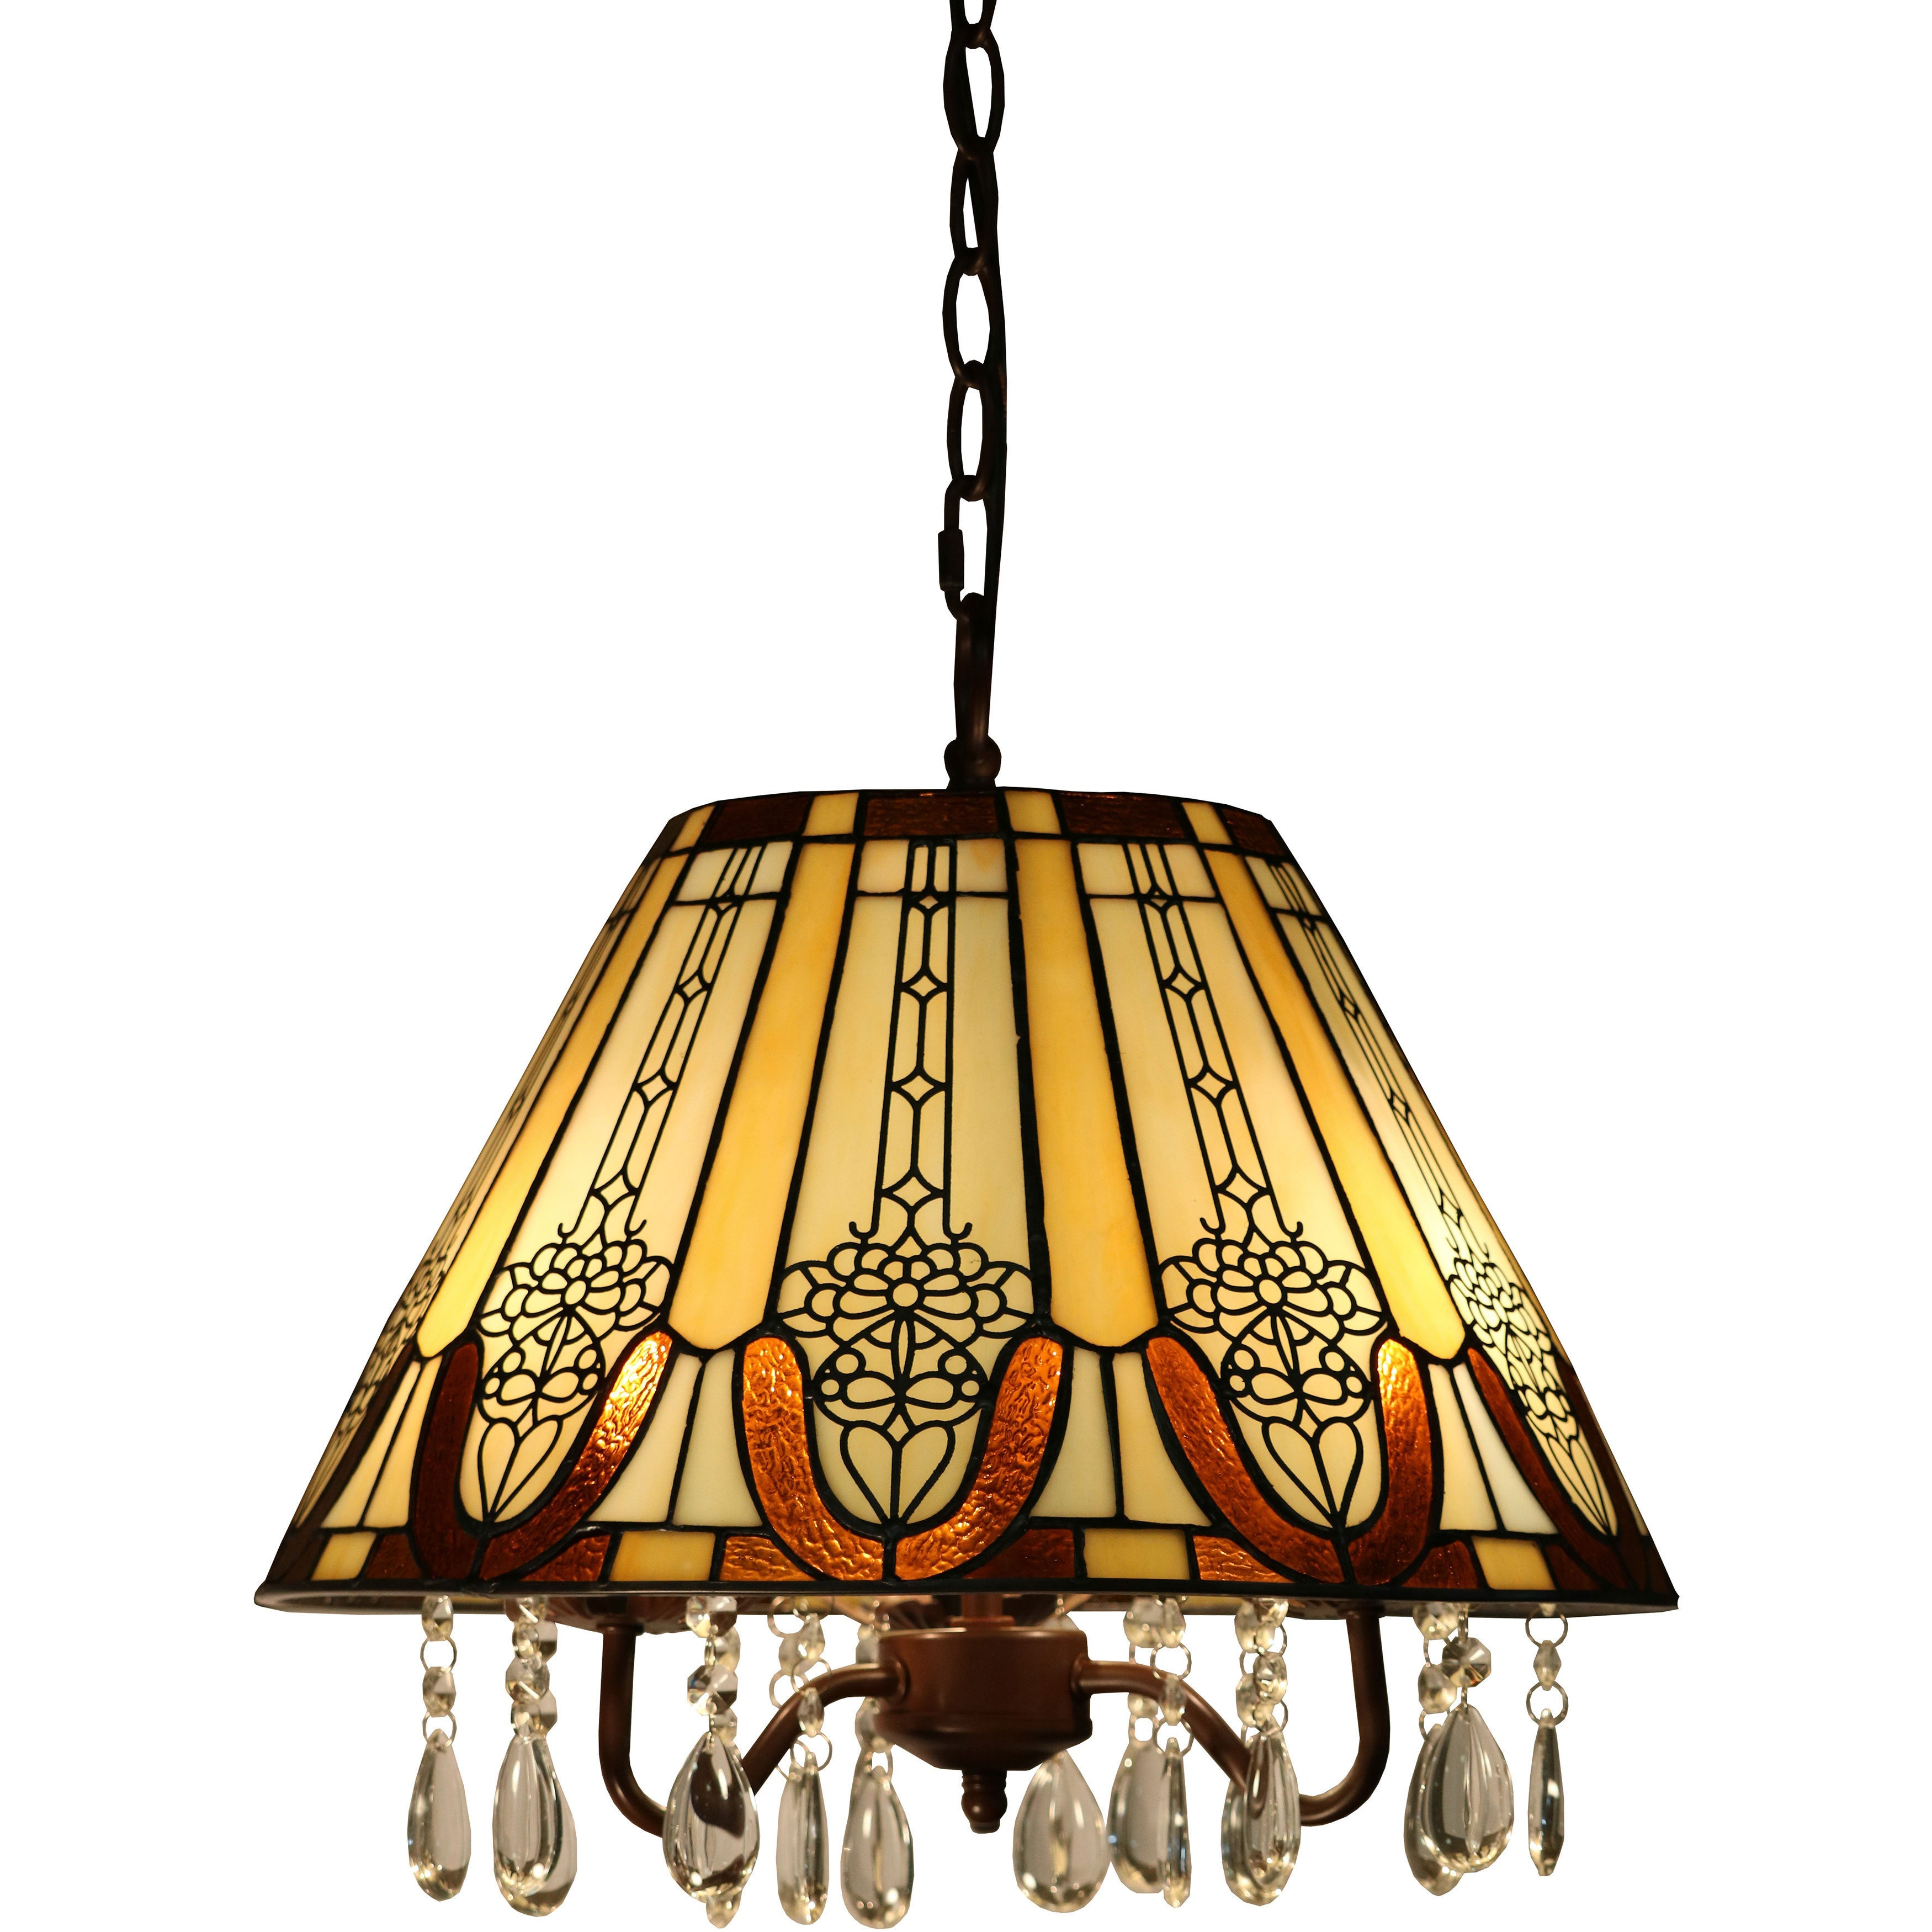 Wyatt 3 light Tiffany style 16 inch Crystal Hanging Lamp Free